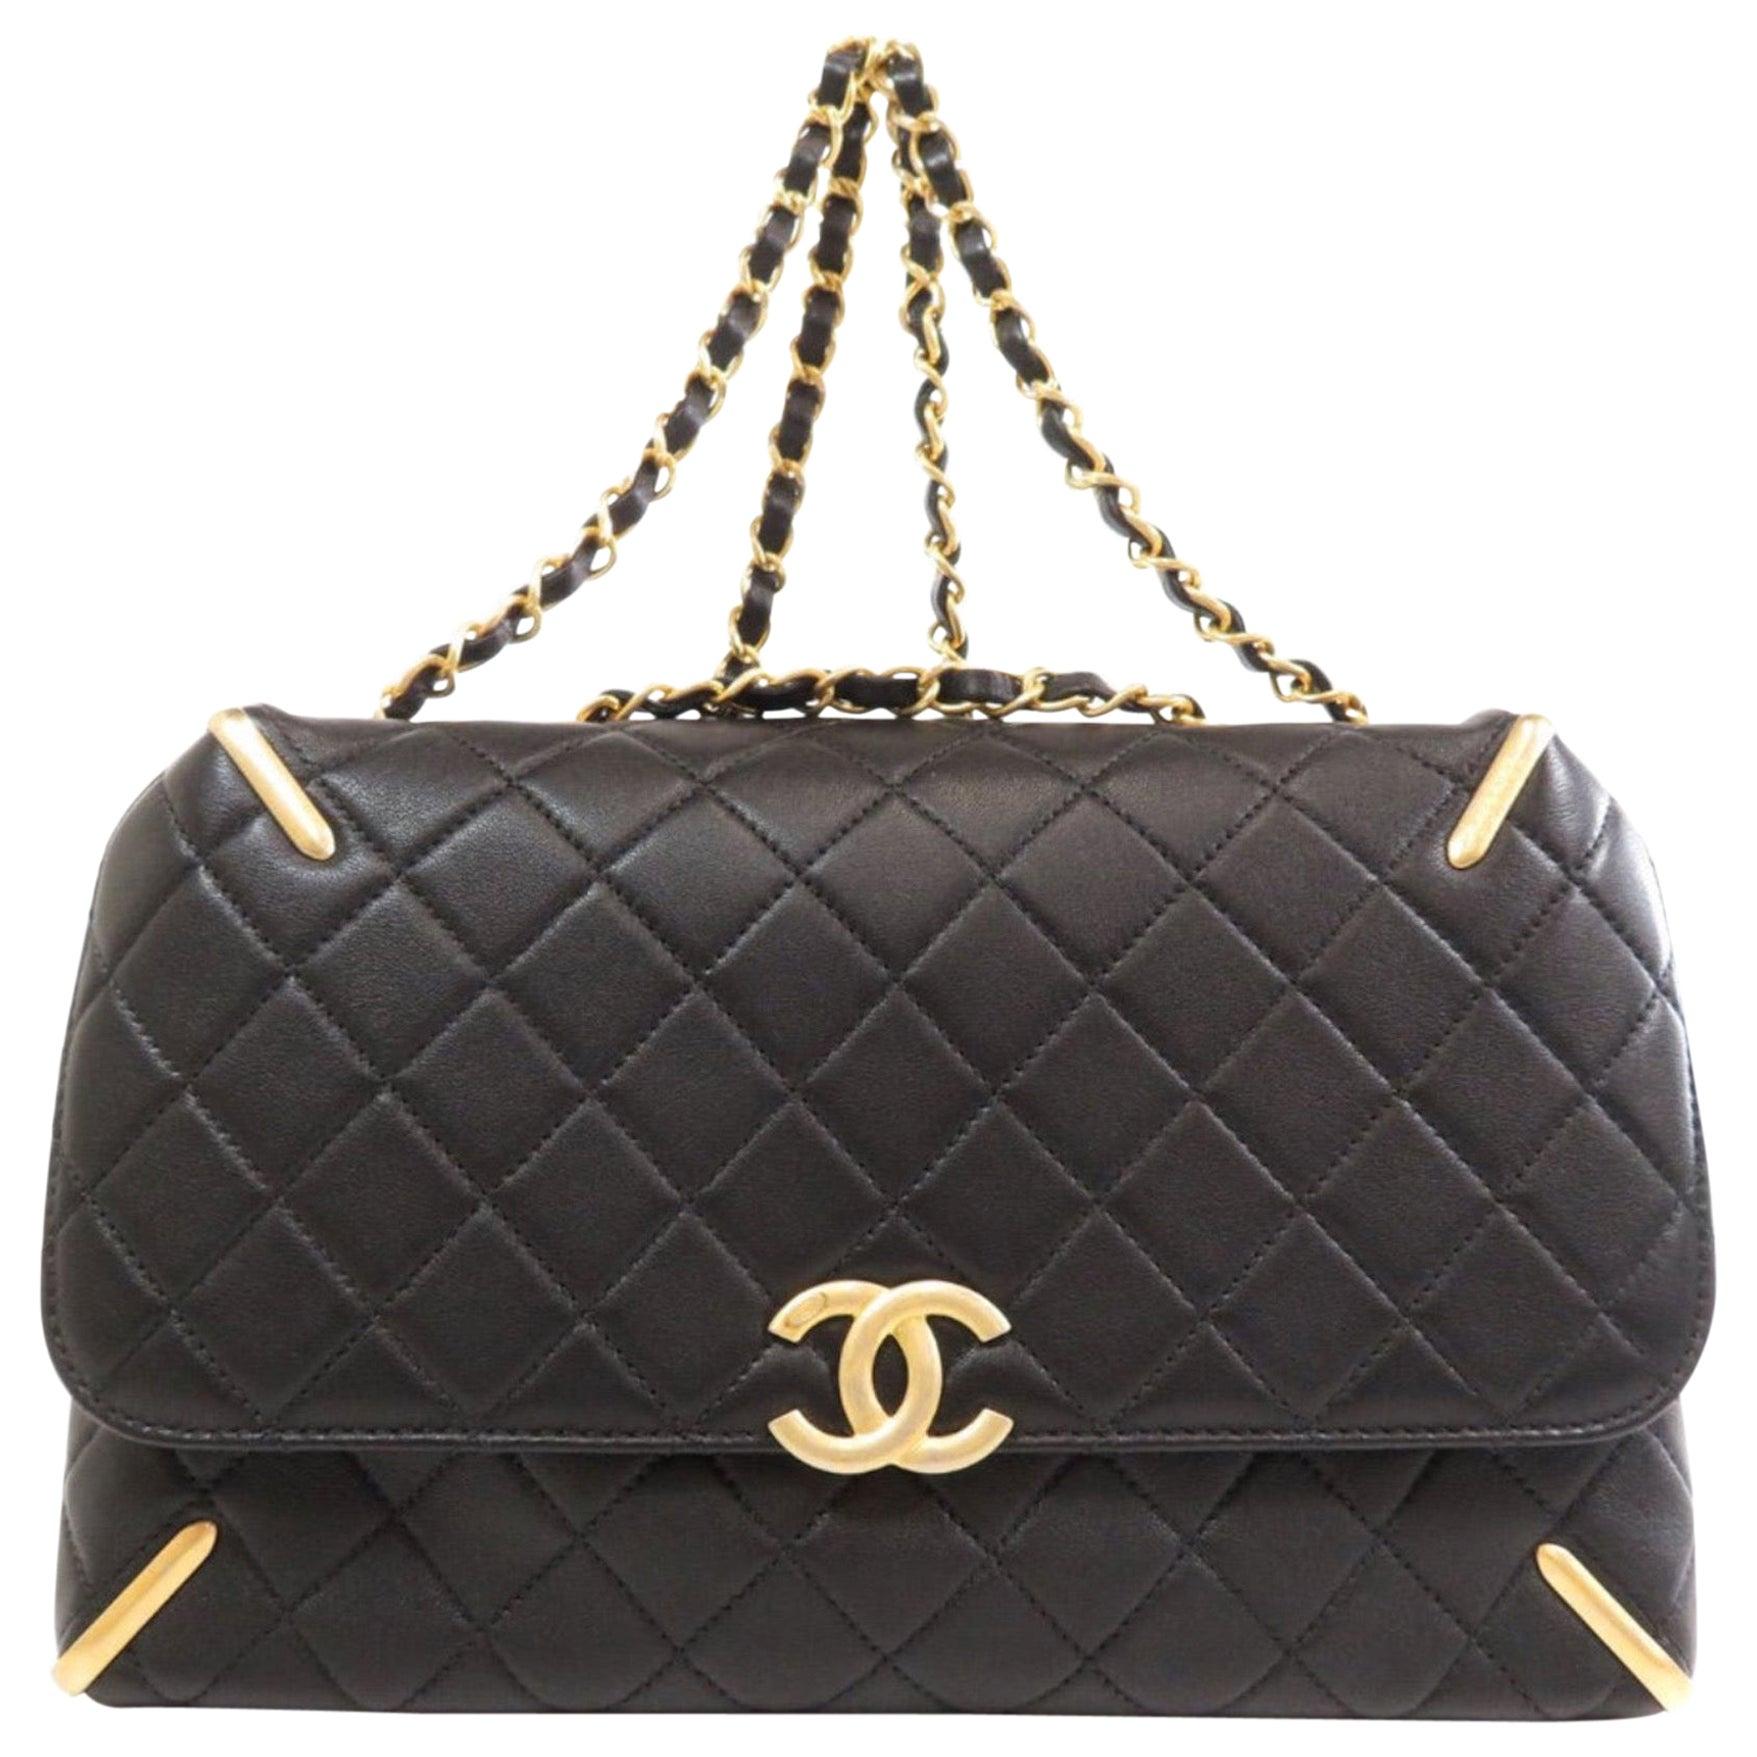 Chanel Black Leather Quilted Gold Evening Tote Carryall Shoulder Flap Bag